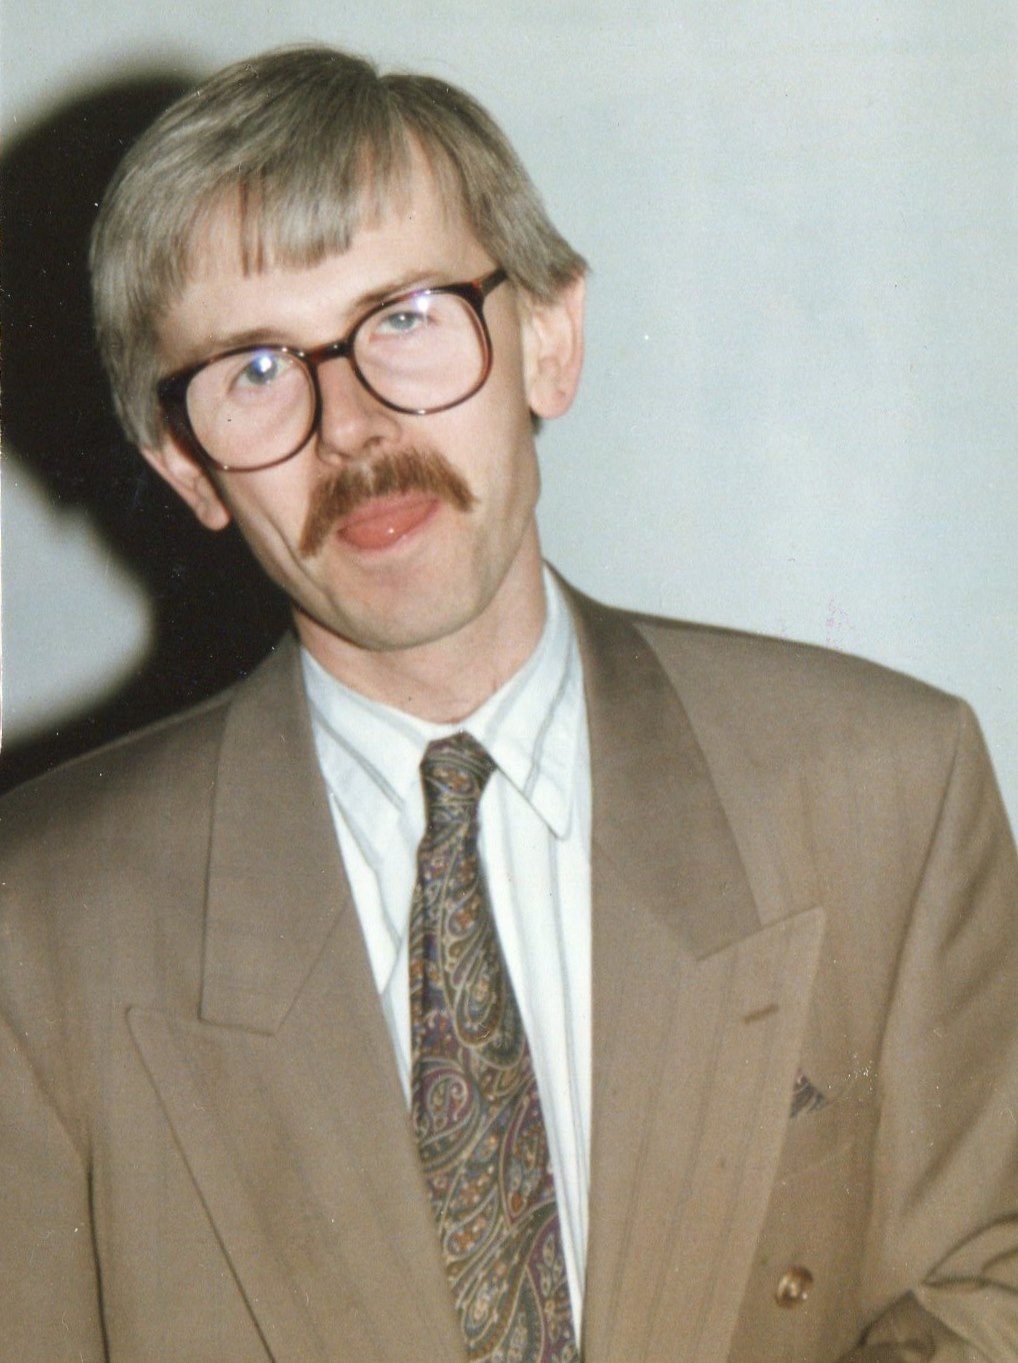 Fiddler on the Roof, 1991 (www.lmvg.ie) (19)